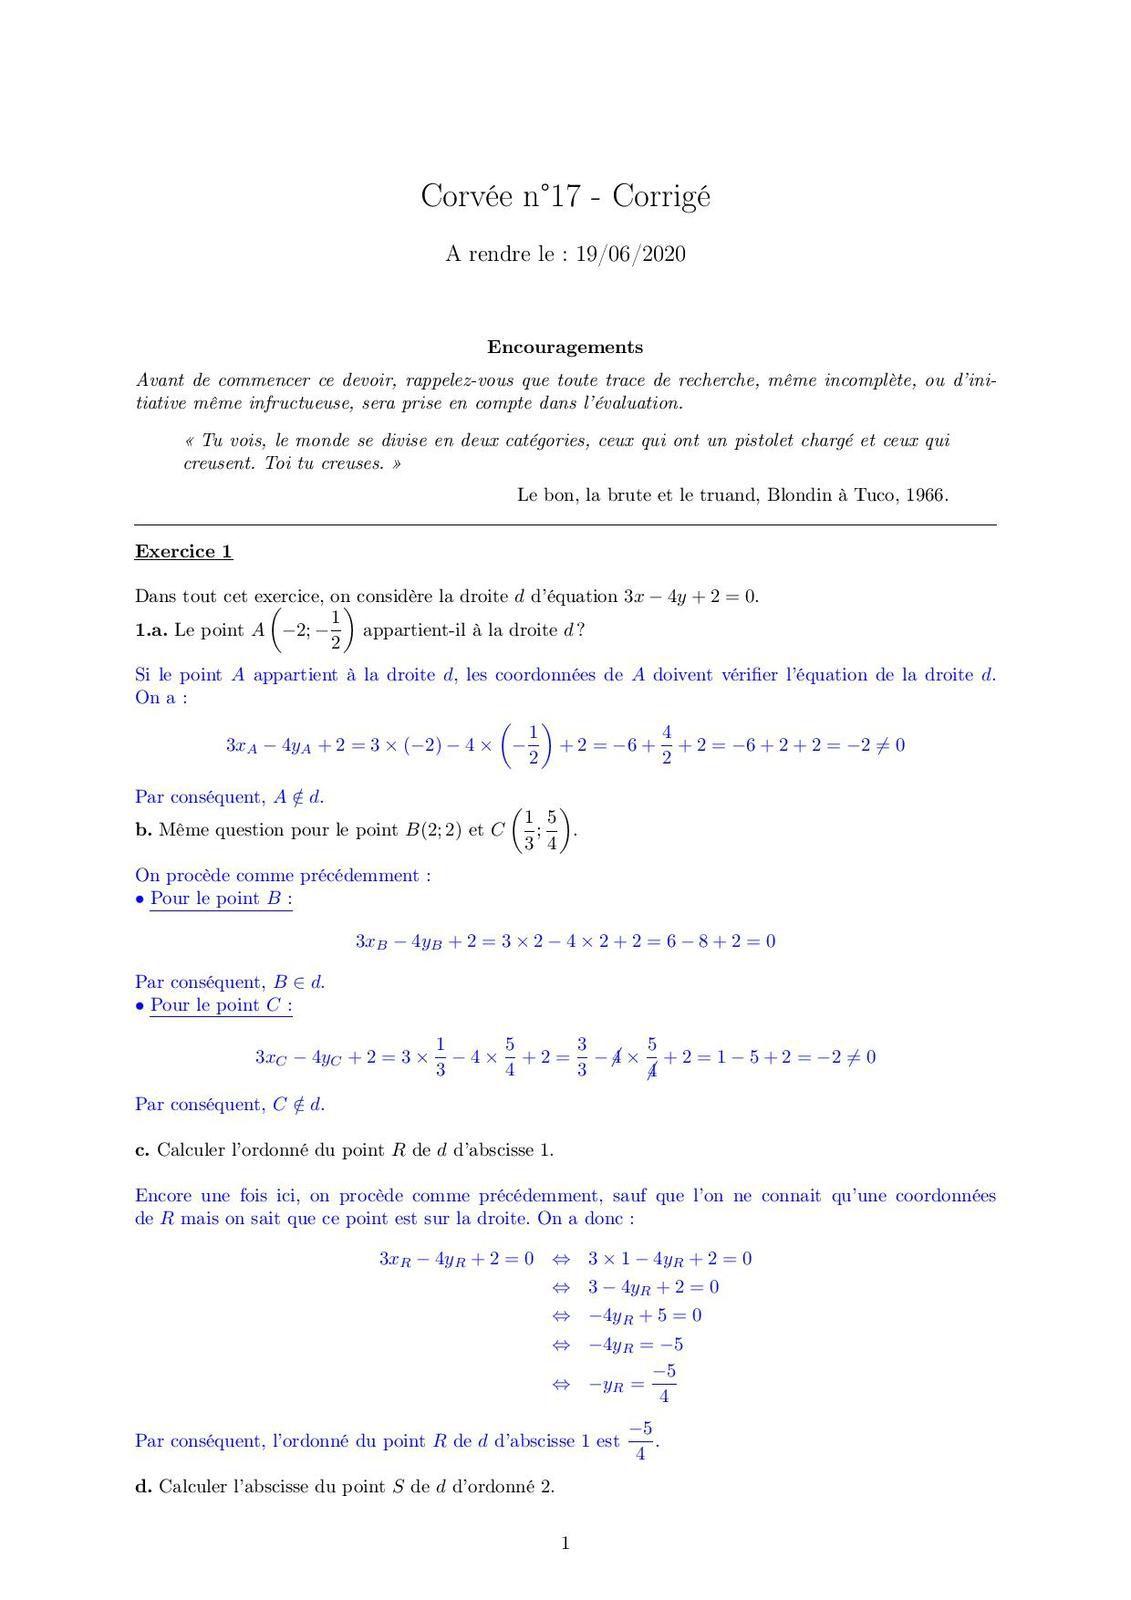 Corvée n°17 - Correction Corvée n°17